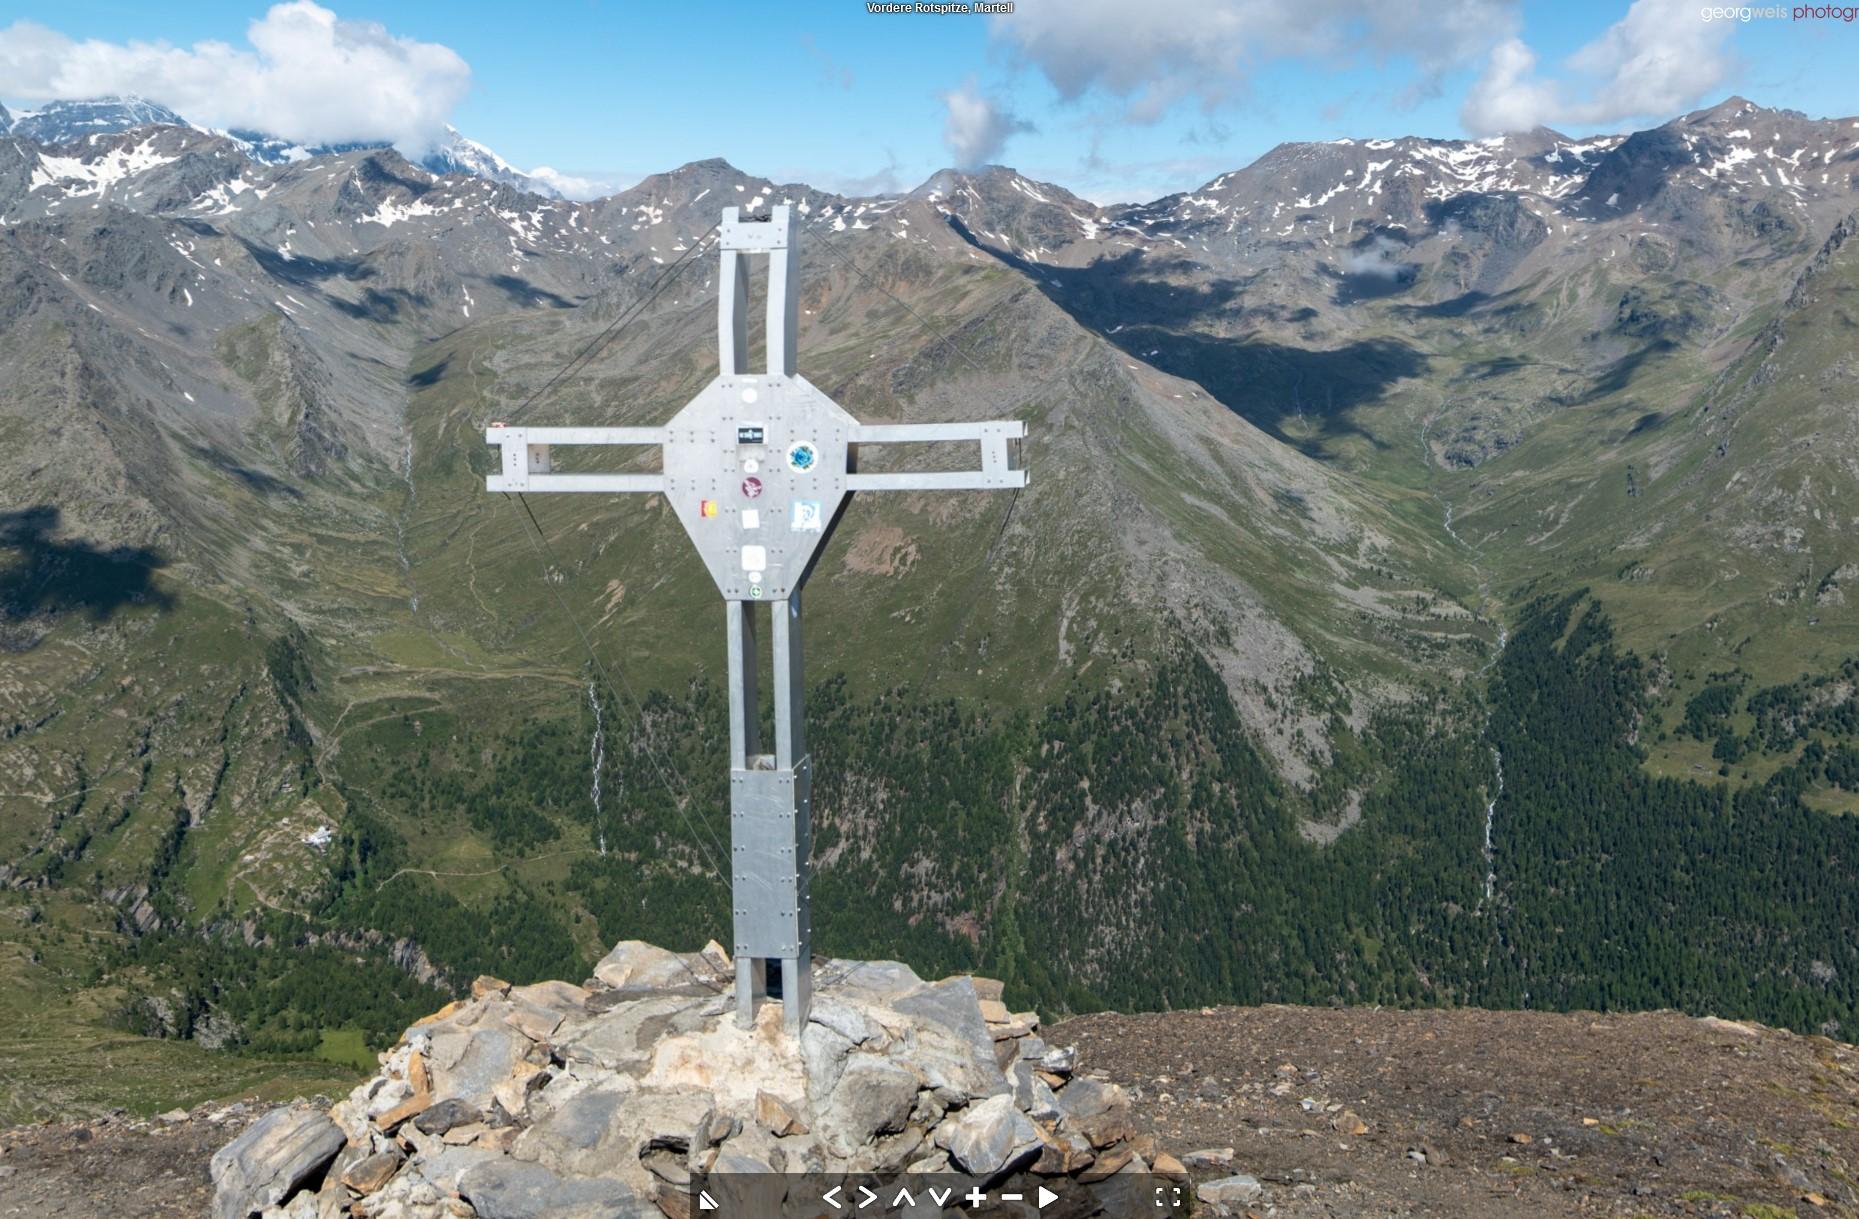 Vordere Rotspitze (3033 m), Martell